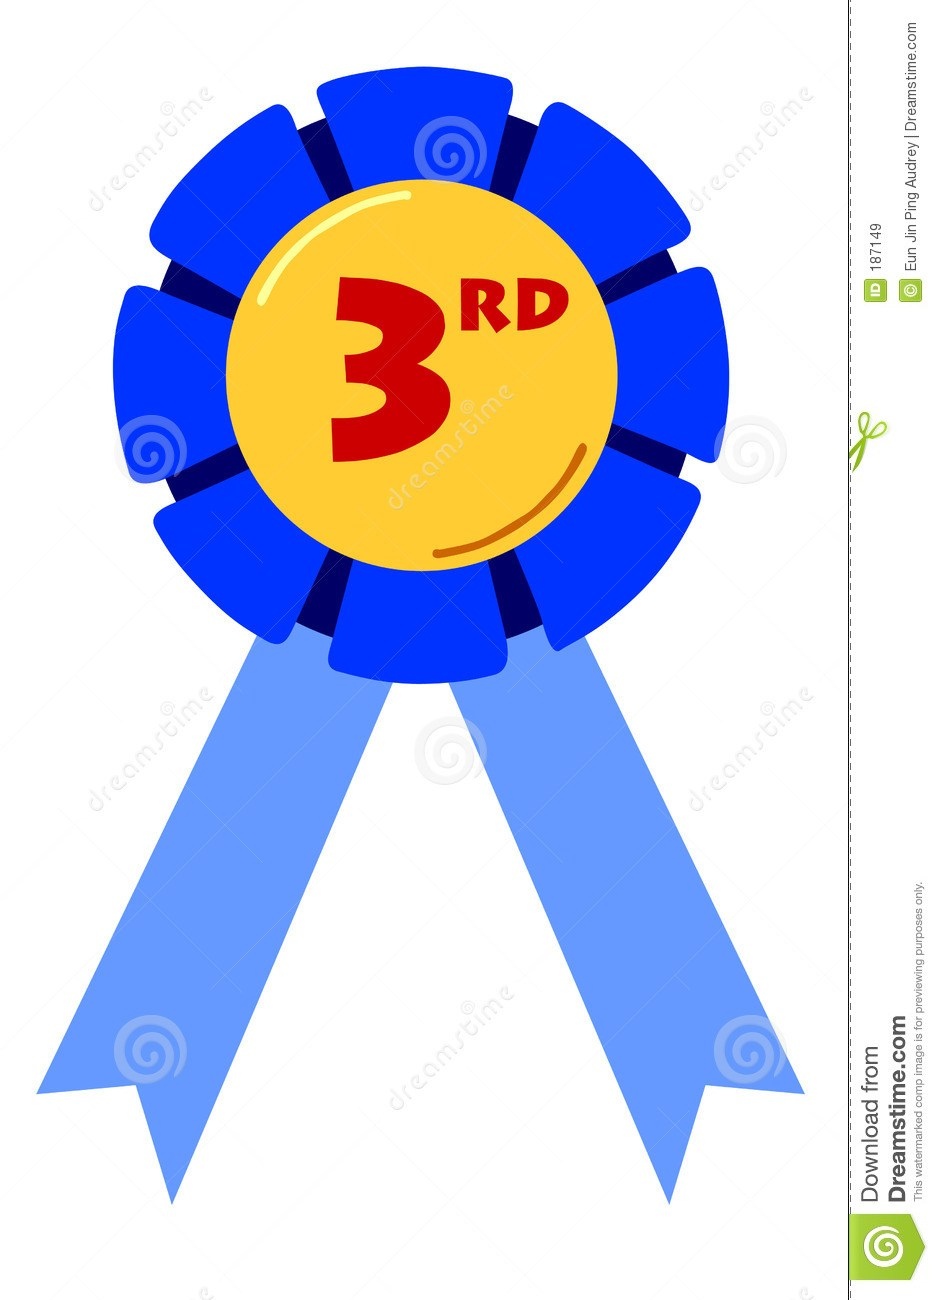 3rd place clipart picture transparent 3rd place ribbon clipart 4 » Clipart Portal picture transparent